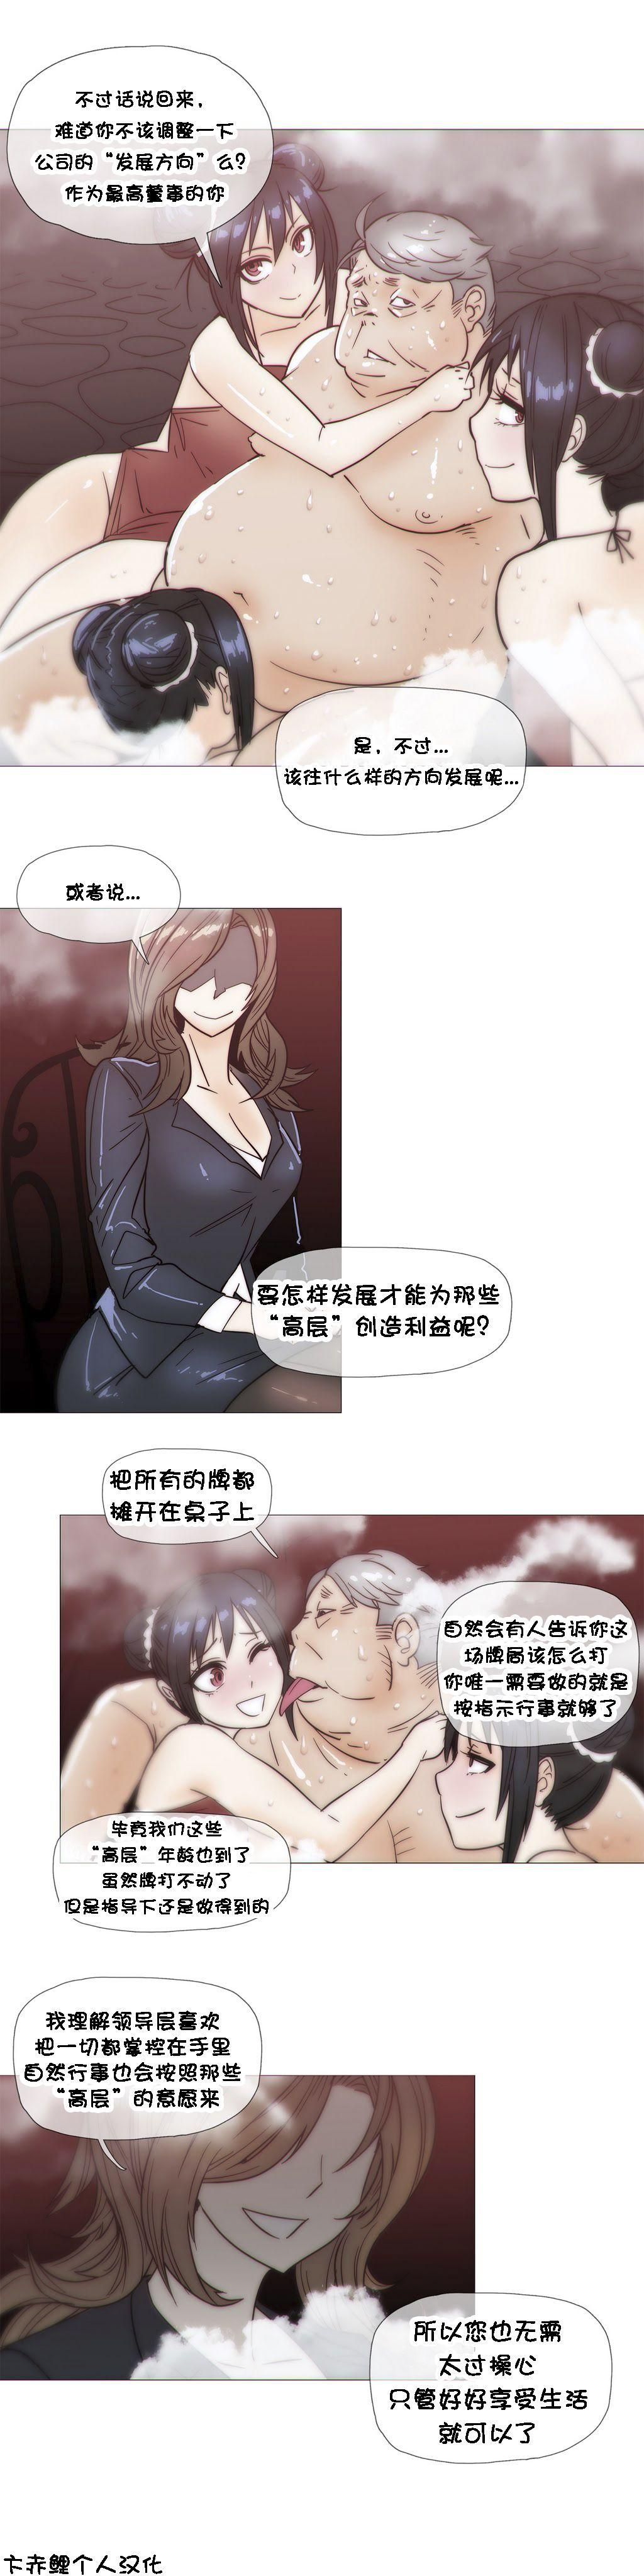 HouseHold Affairs 【卞赤鲤个人汉化】1~33话(持续更新中) 567